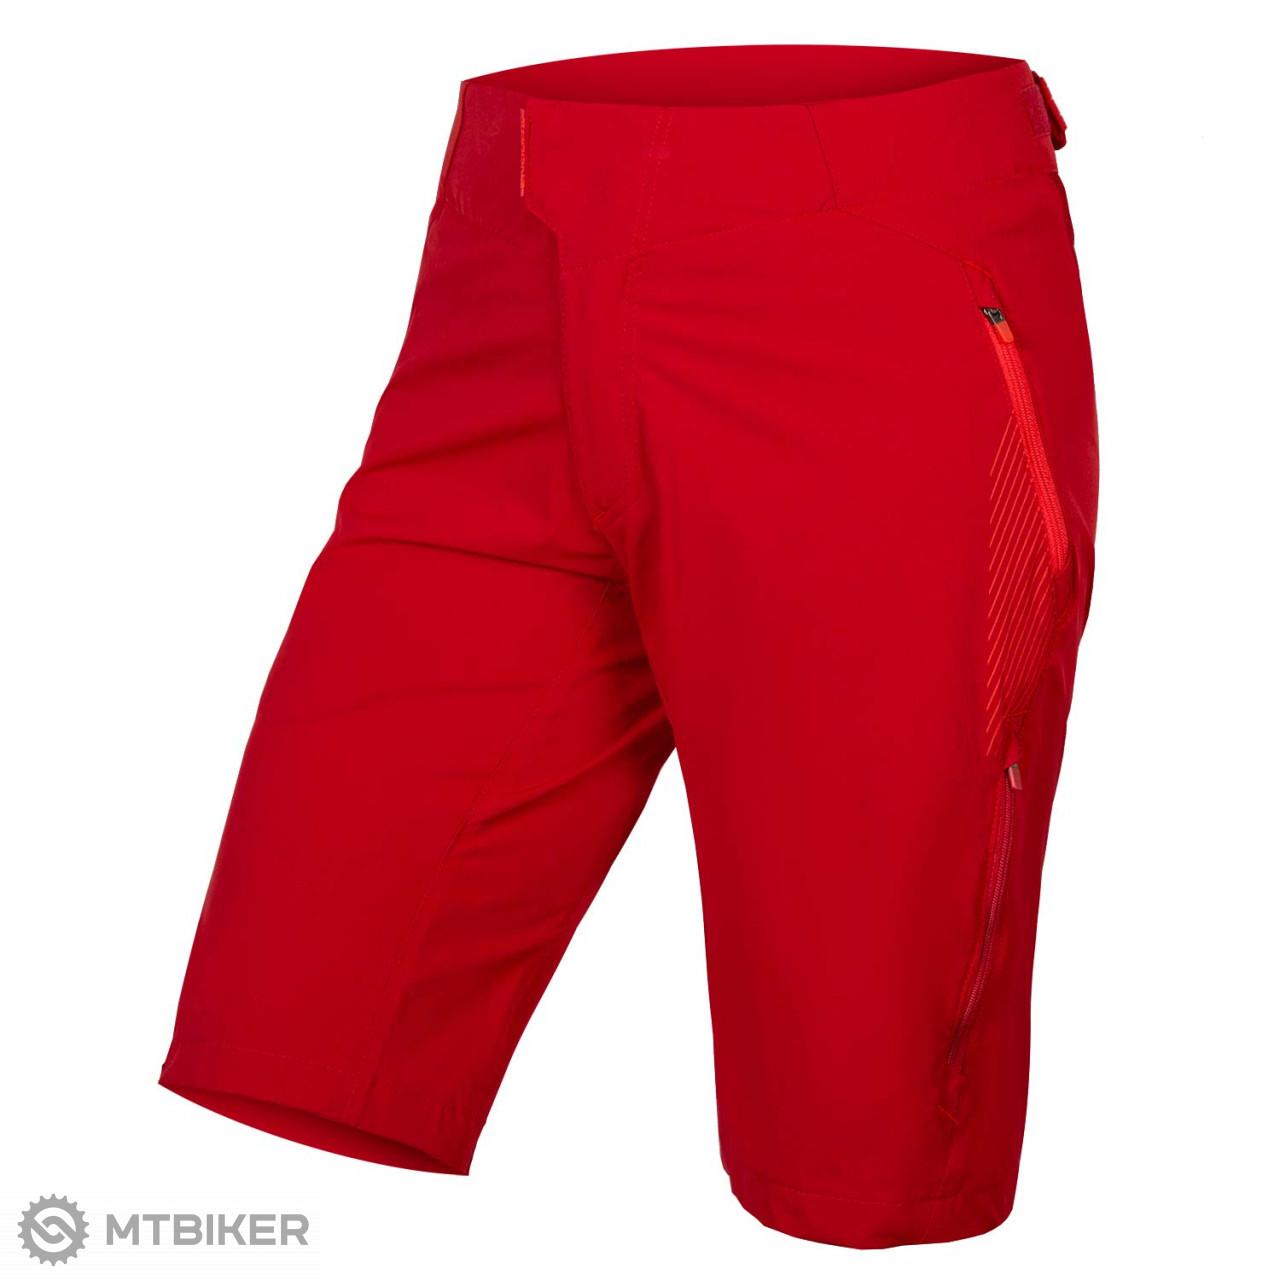 Endura Singletrack Lite II LTD dámske kraťasy rust red - MTBIKER Shop 396d44a529